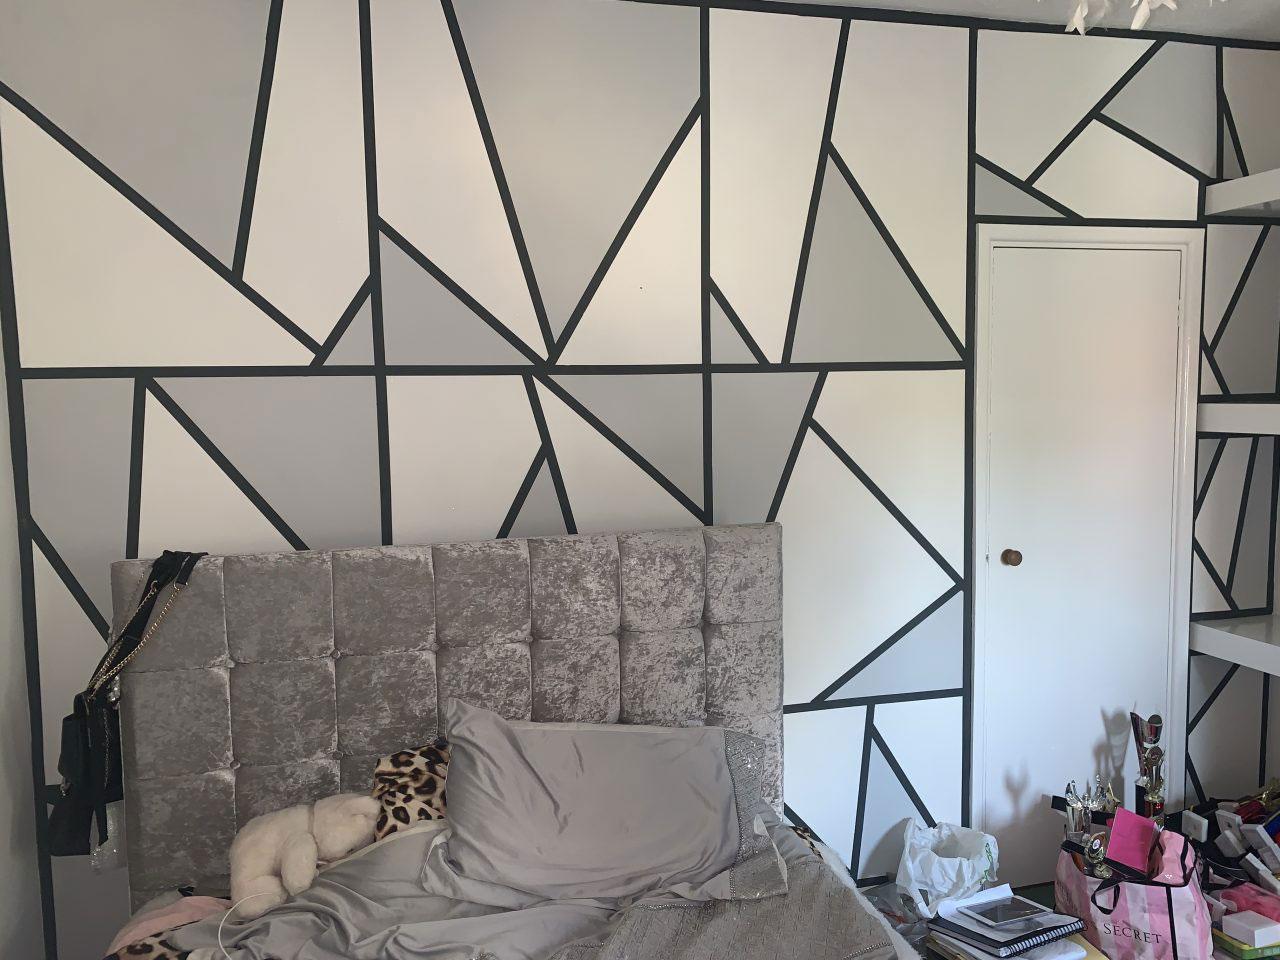 http://www.everettpainting.biz/wp-content/uploads/2020/05/geometric-feature-wall.jpg